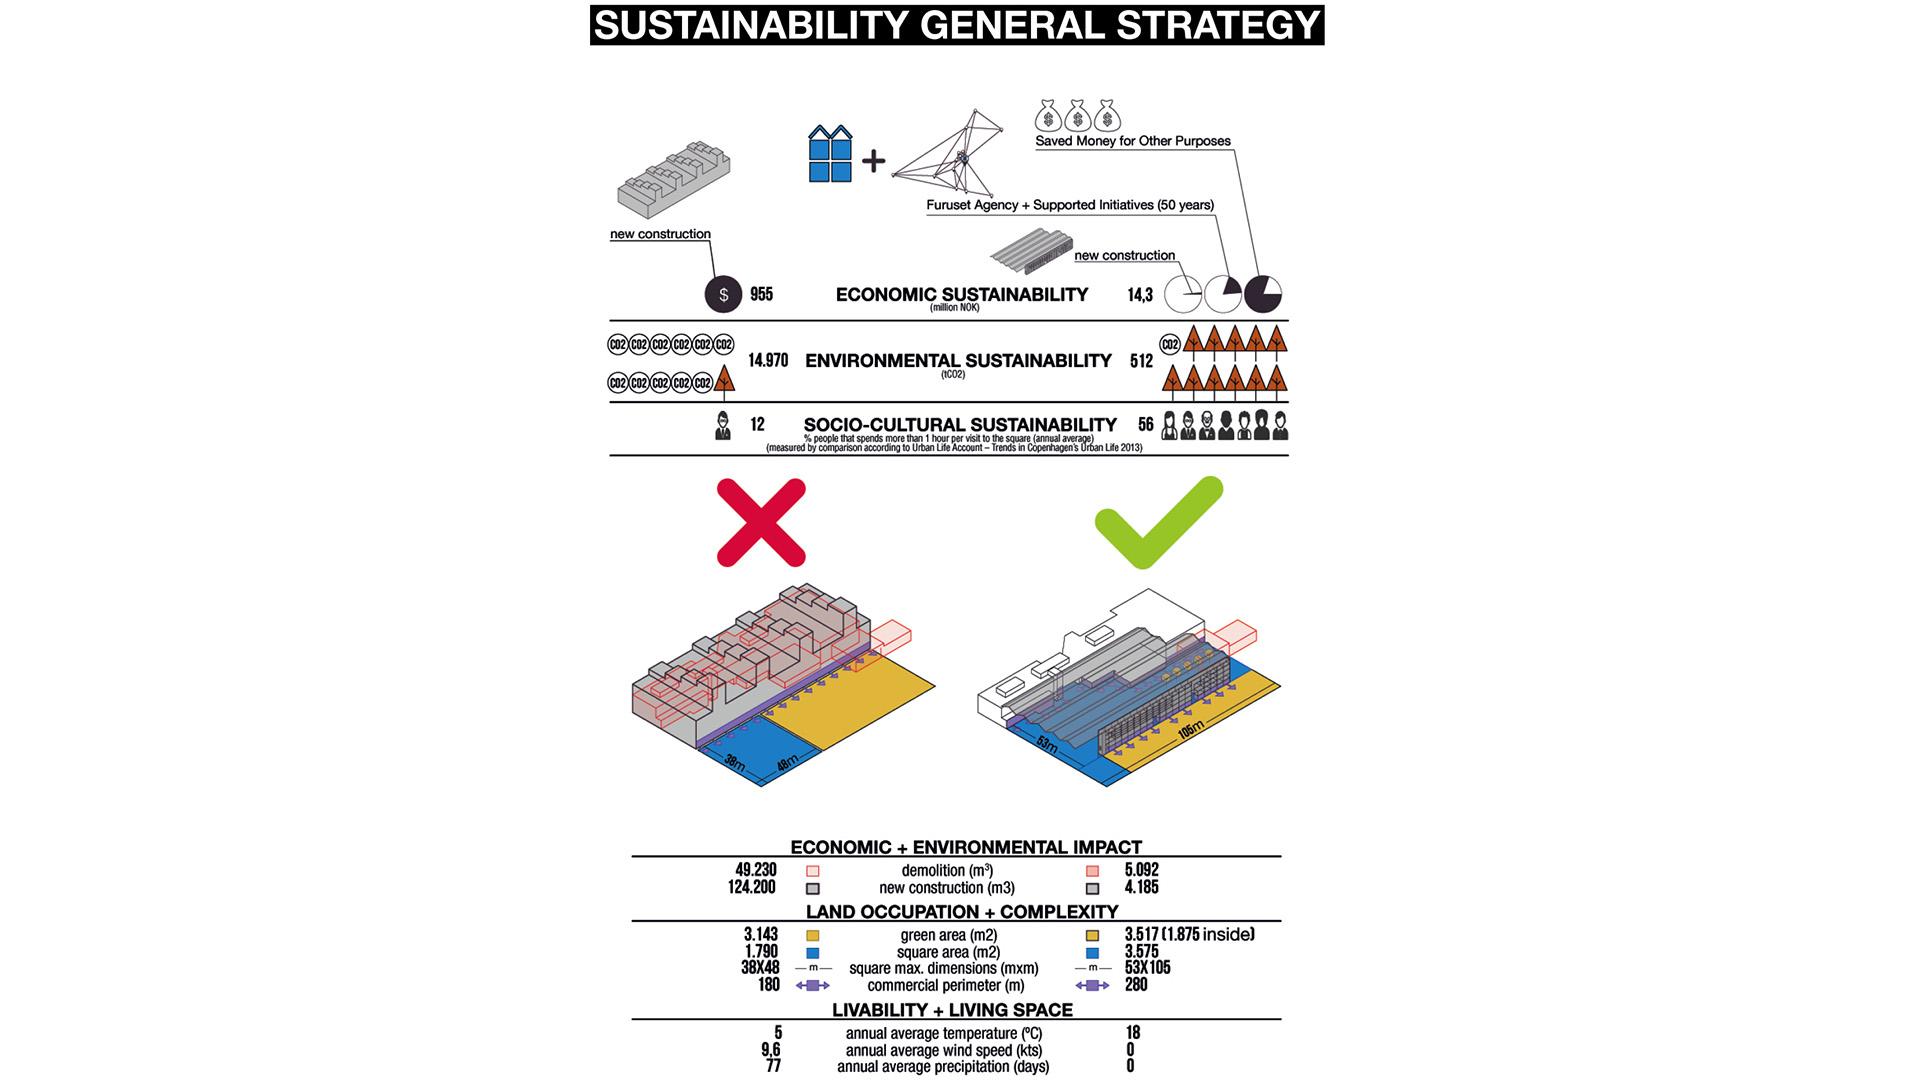 01_furuset-sustinable-strategies